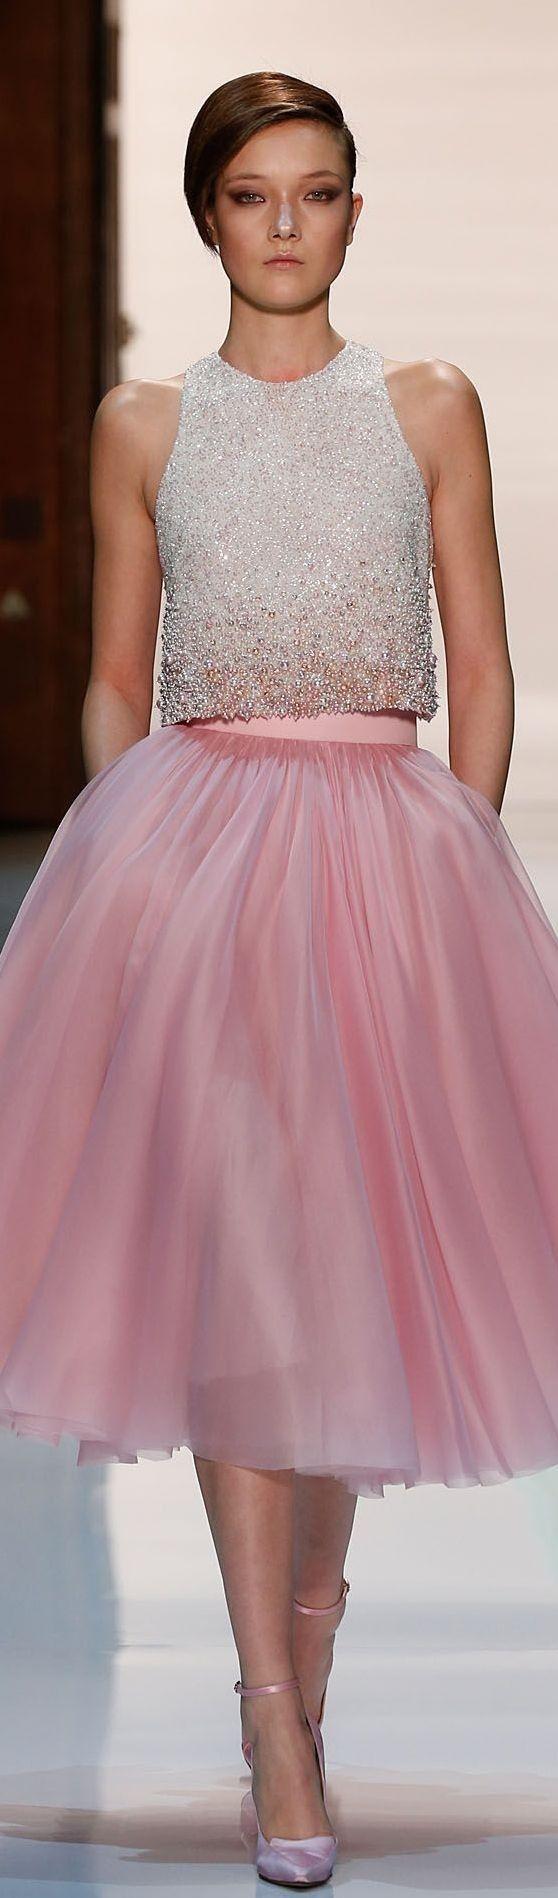 """Georges Hobieka Haute Couture   S/S 2014 """